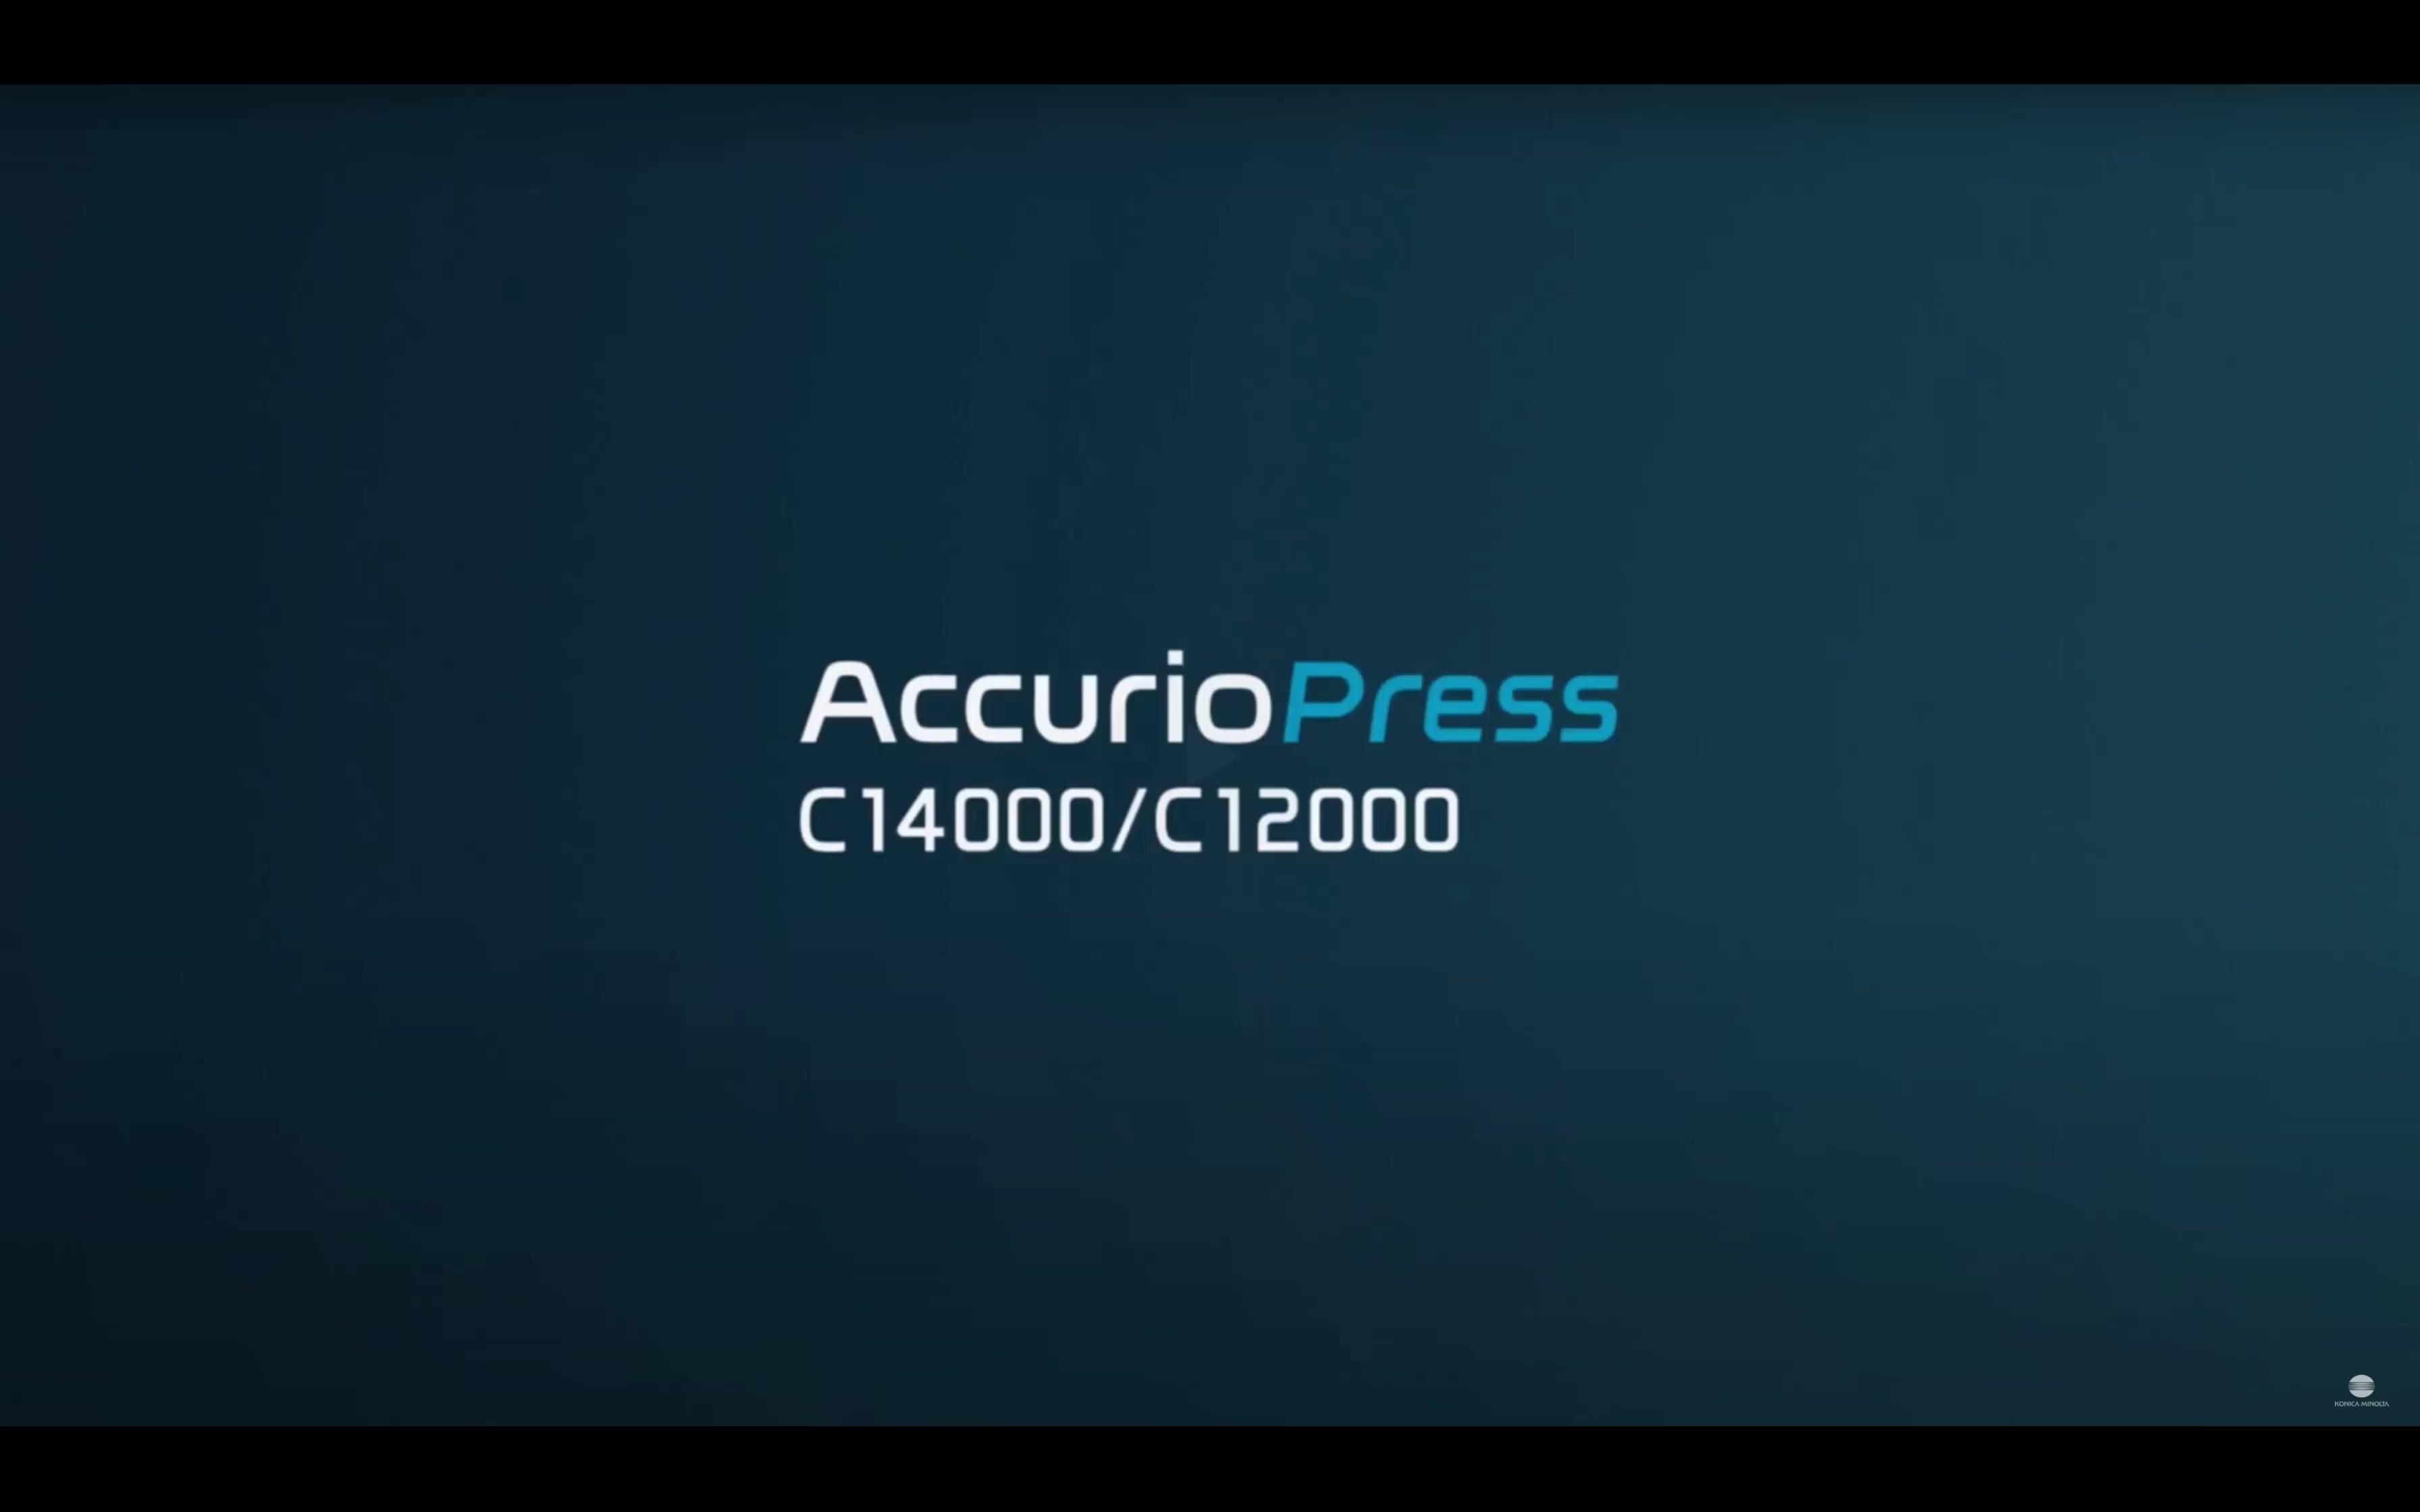 No-Vocals Konica Minolta AccurioPress C14000-C12000- Copy 01